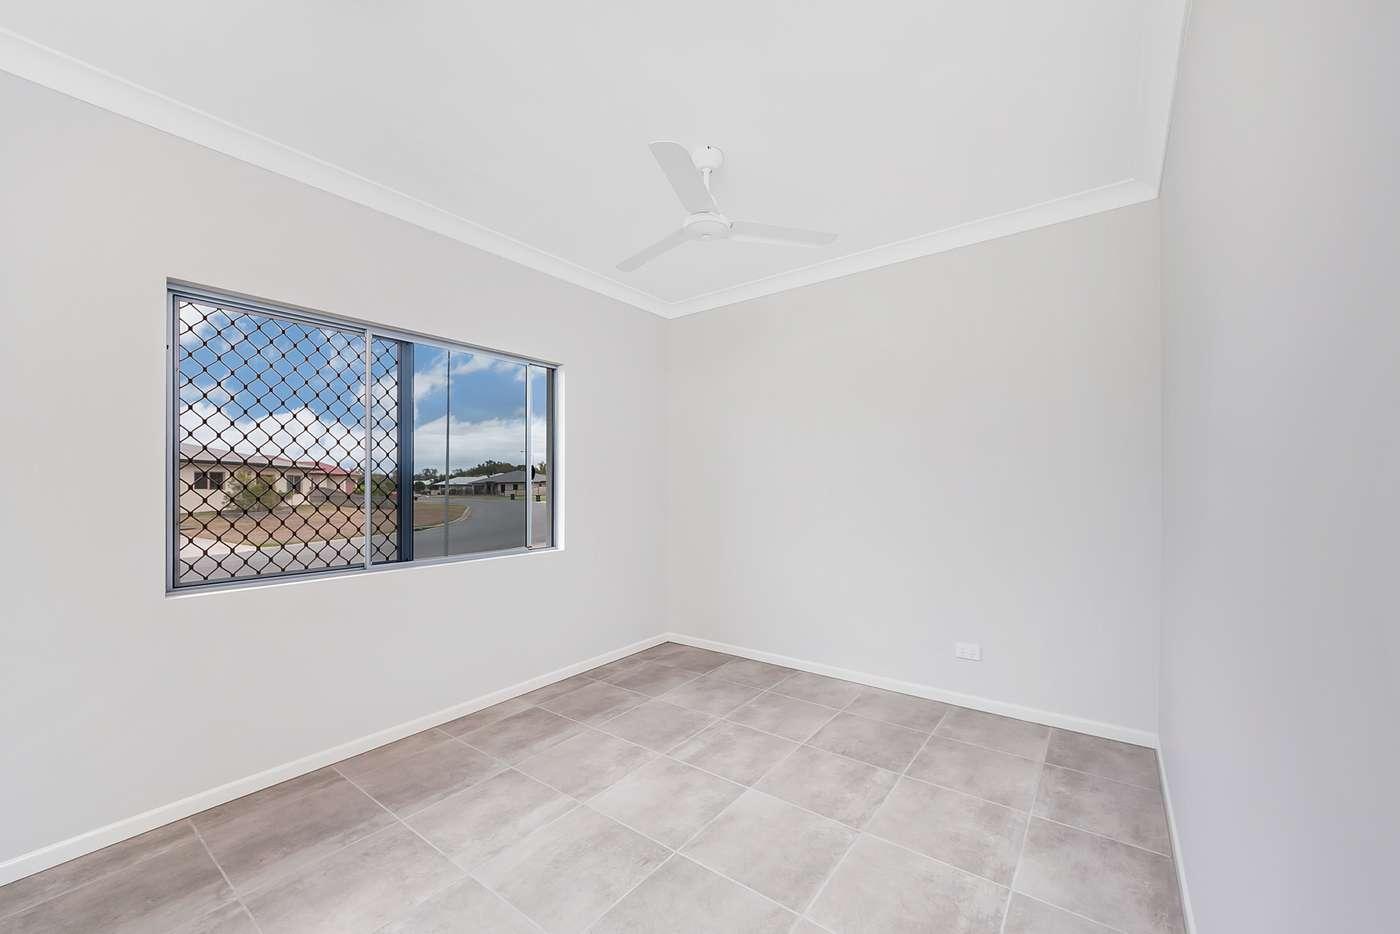 Sixth view of Homely house listing, 6 Amaroo Drive, Mareeba QLD 4880